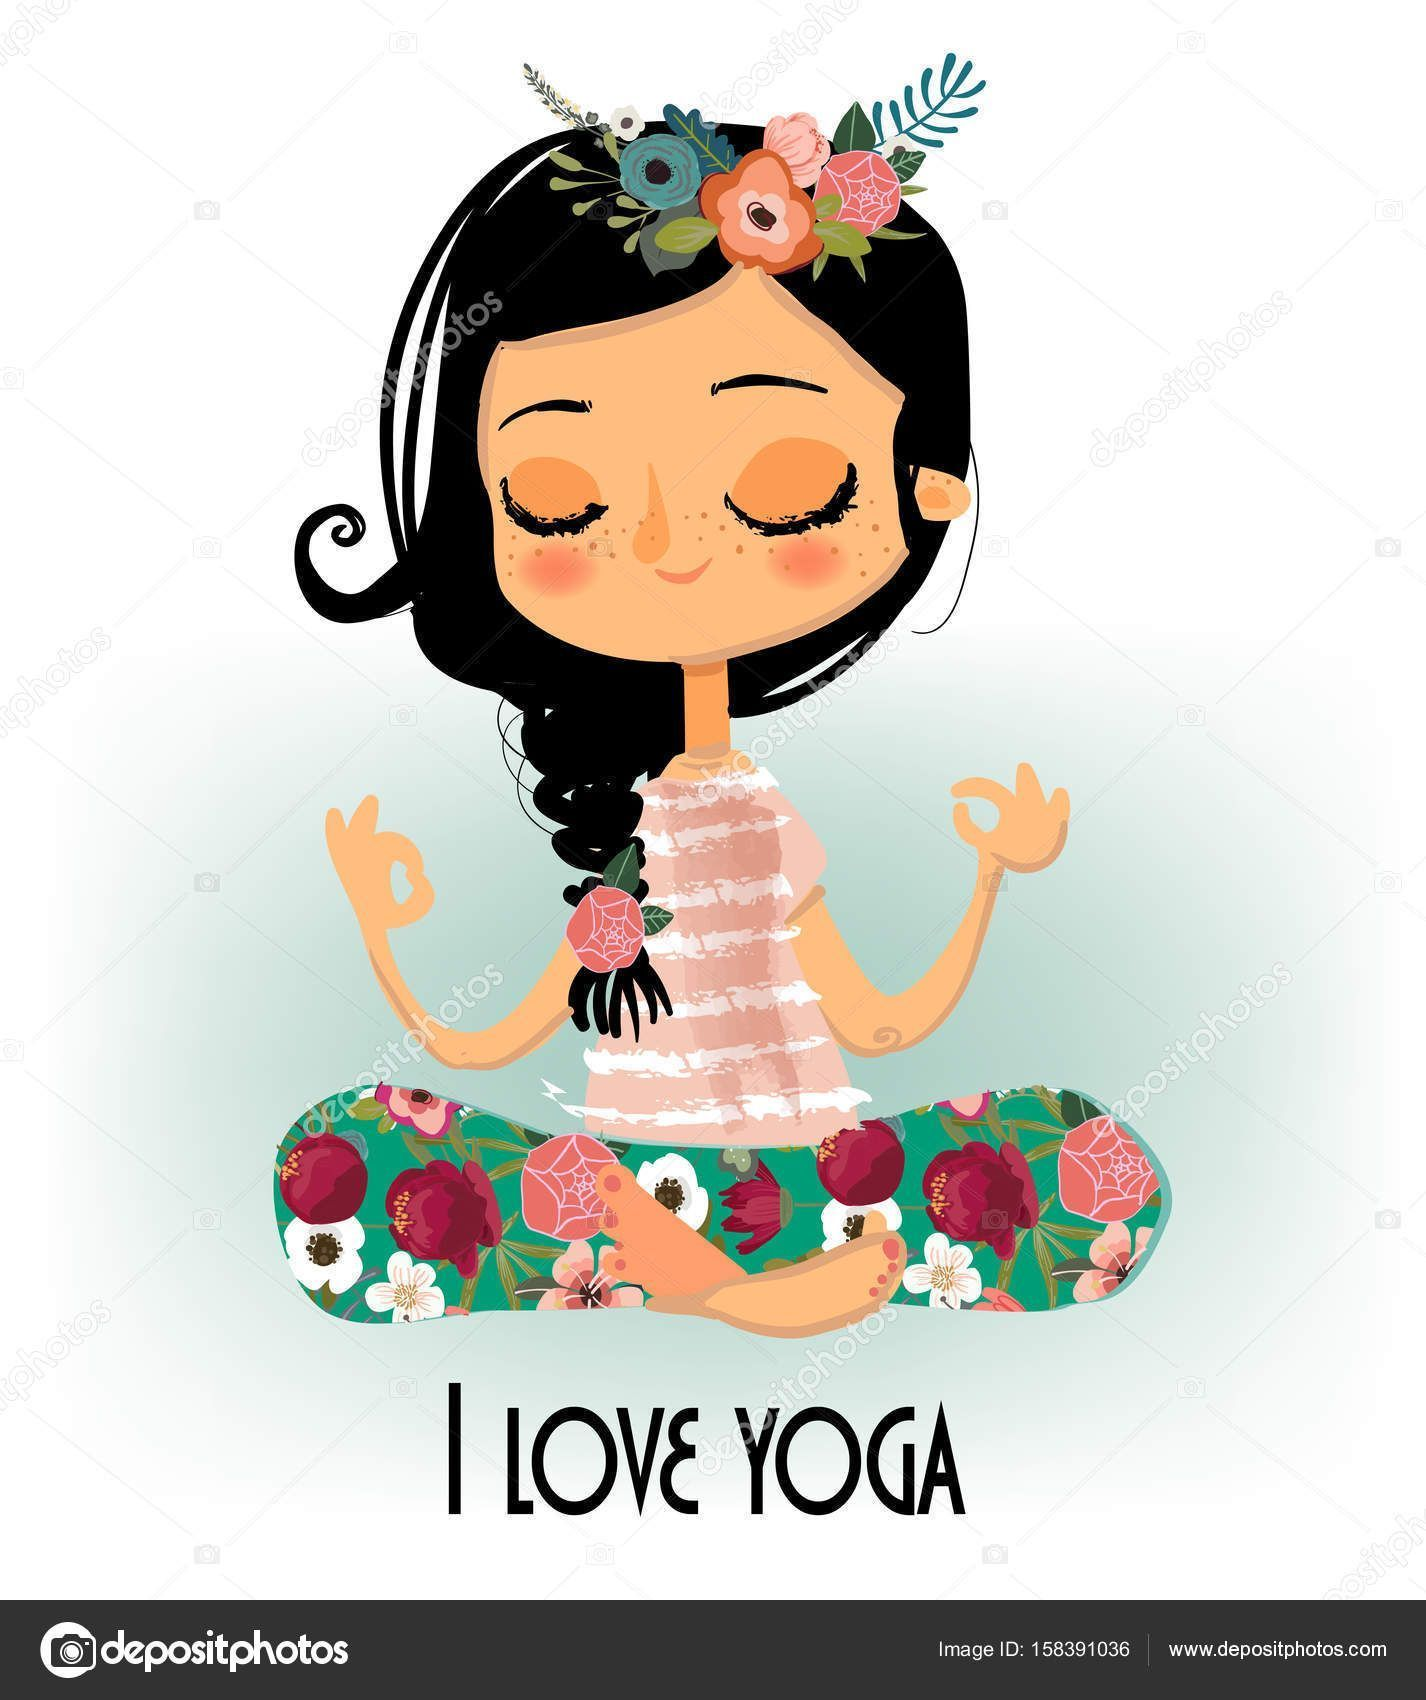 Descargar Chica De Dibujos Animados Lindo Yoga Ilustracion De Stock Descargar Chica De Dibujos Animados L In 2020 Yoga Cartoon Girl Cartoon Yoga Inspiration Art